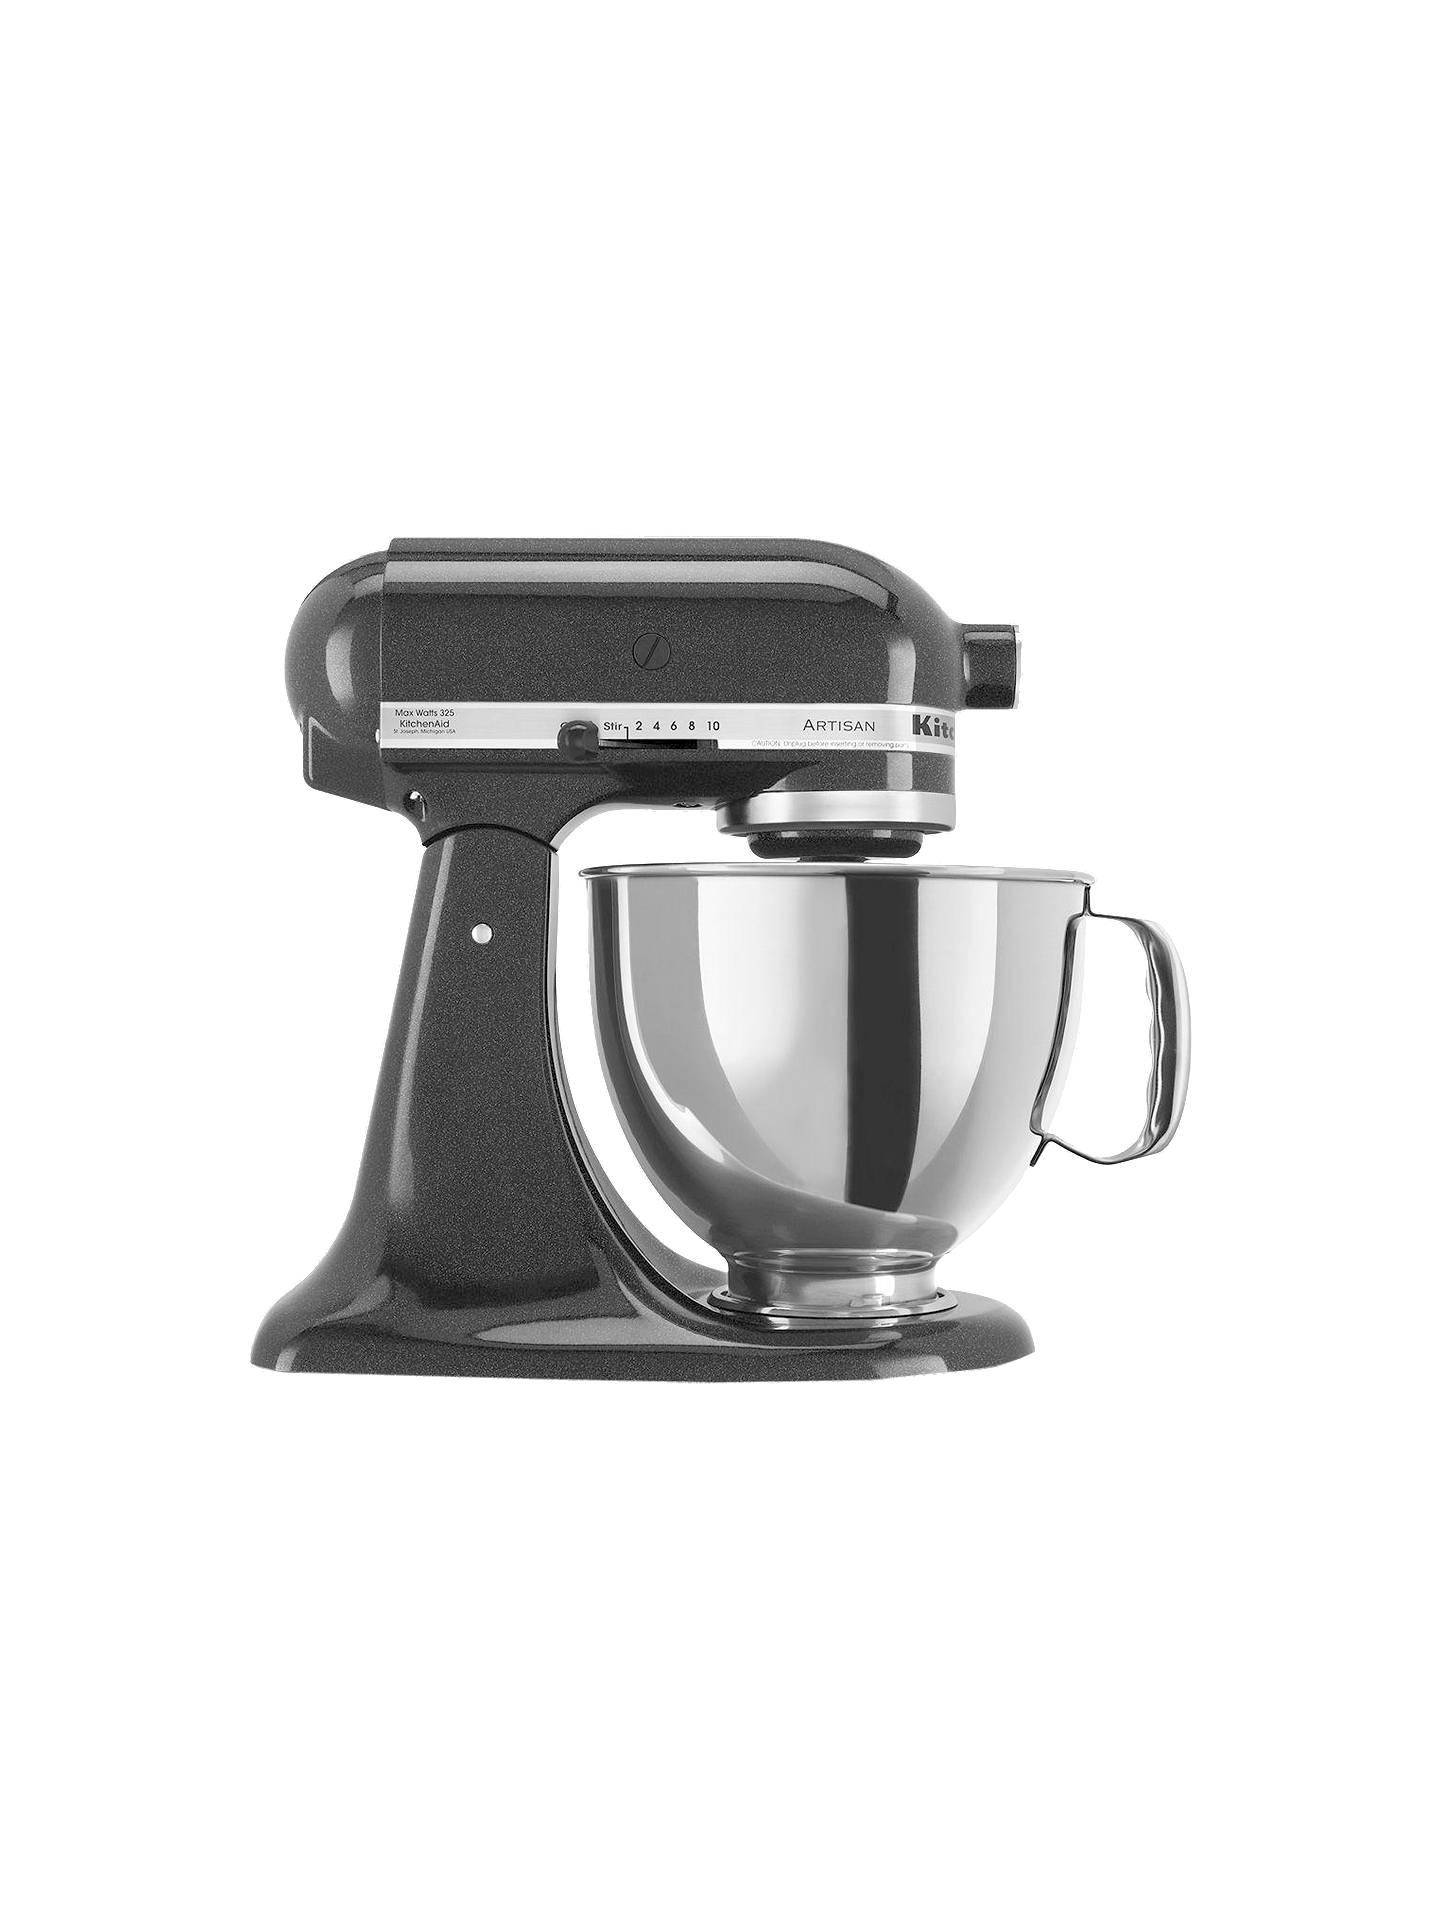 Kitchenaid 150 Artisan 4 8l Stand Mixer Black Caviar At